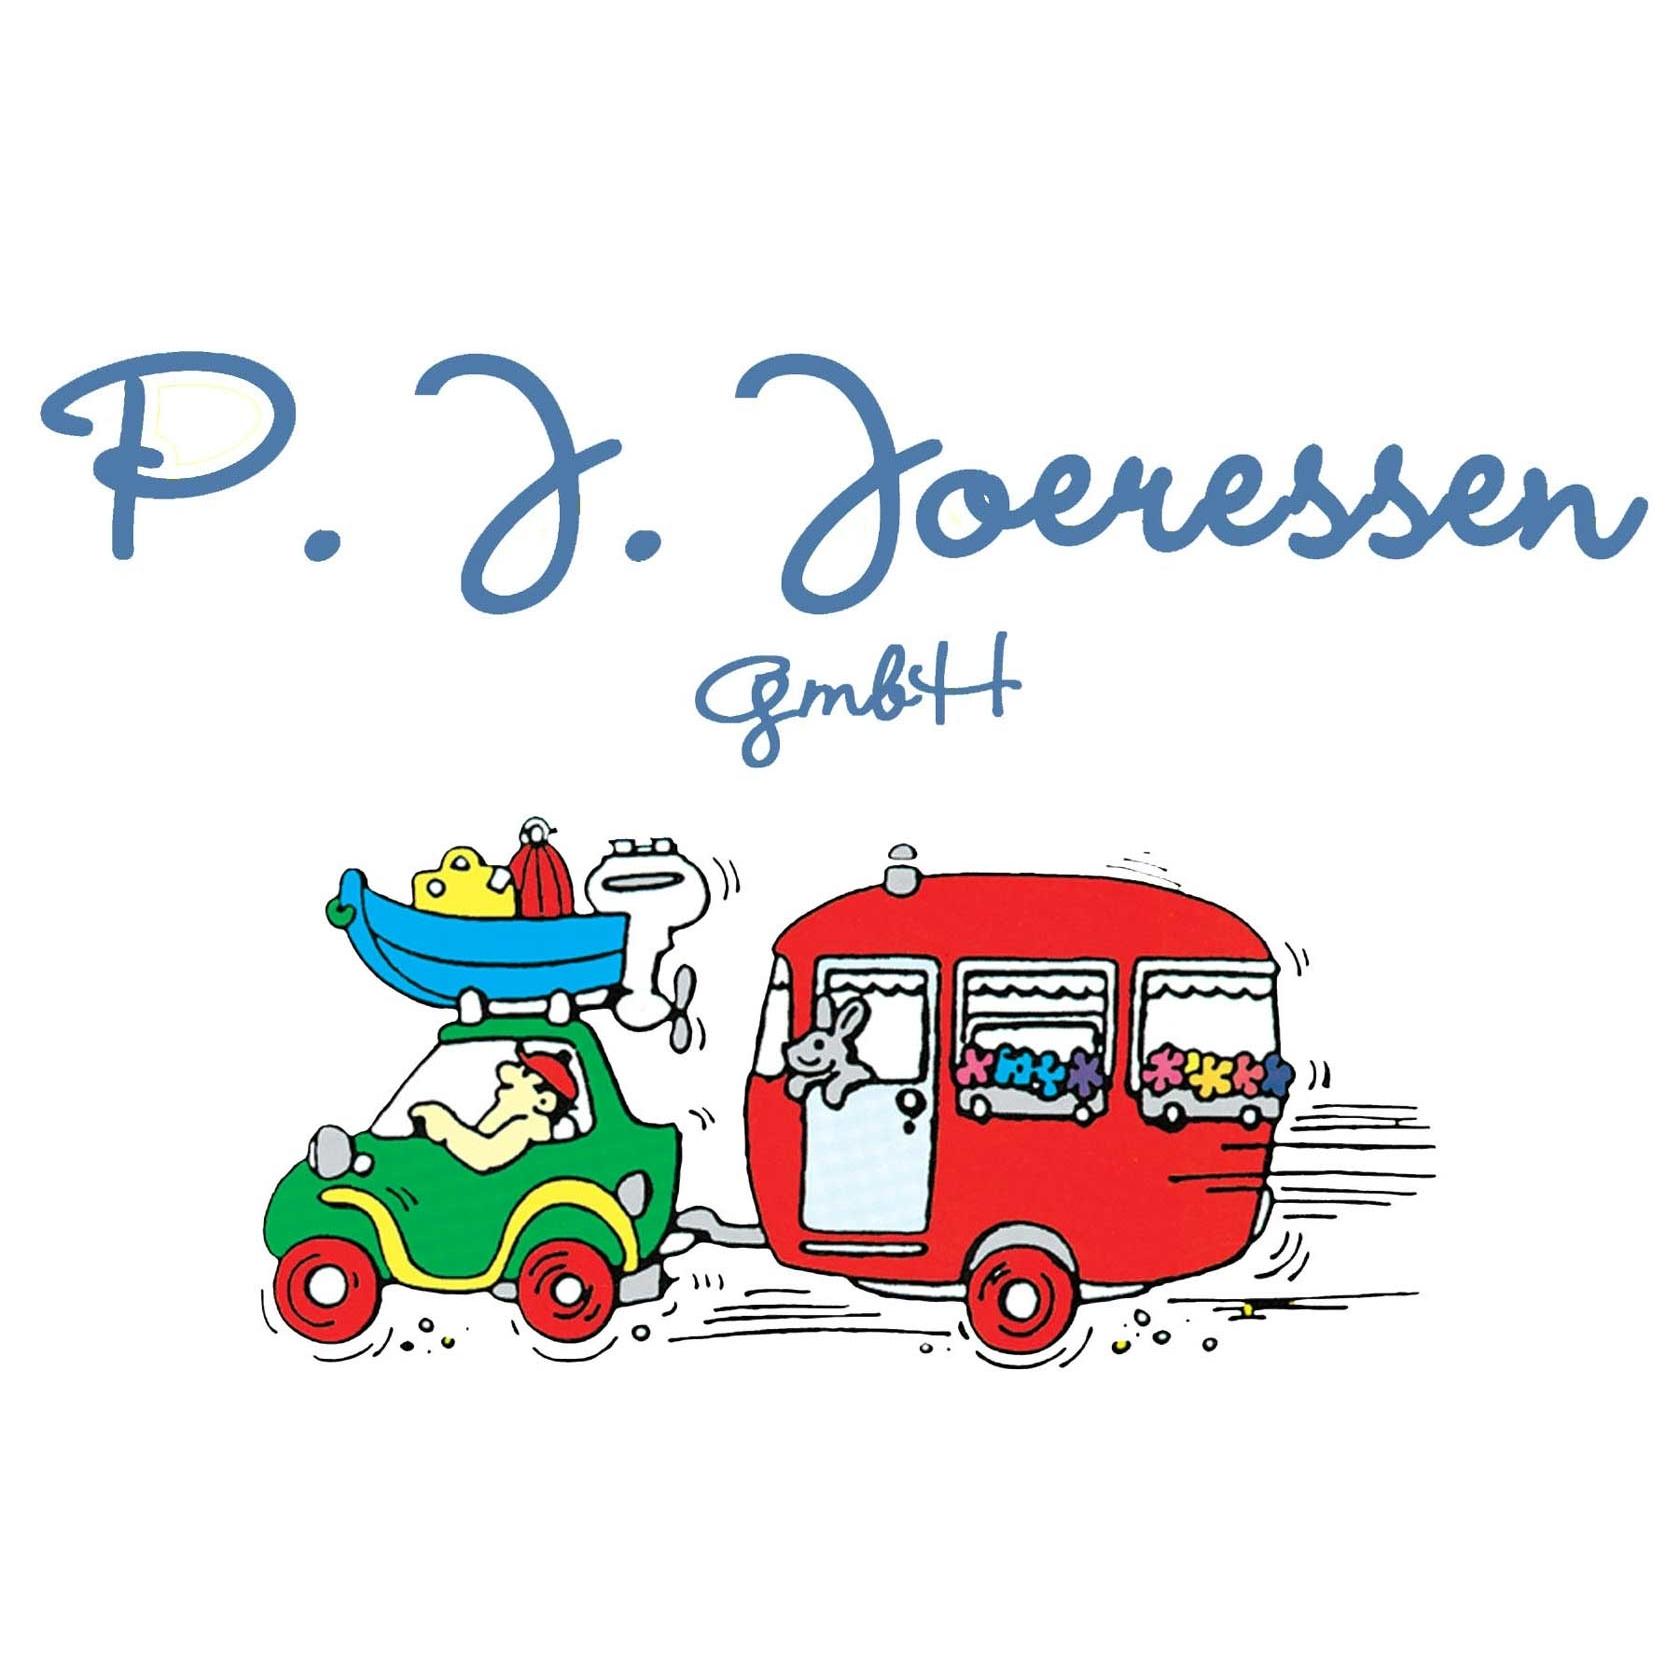 Joeressen P.J. GmbH